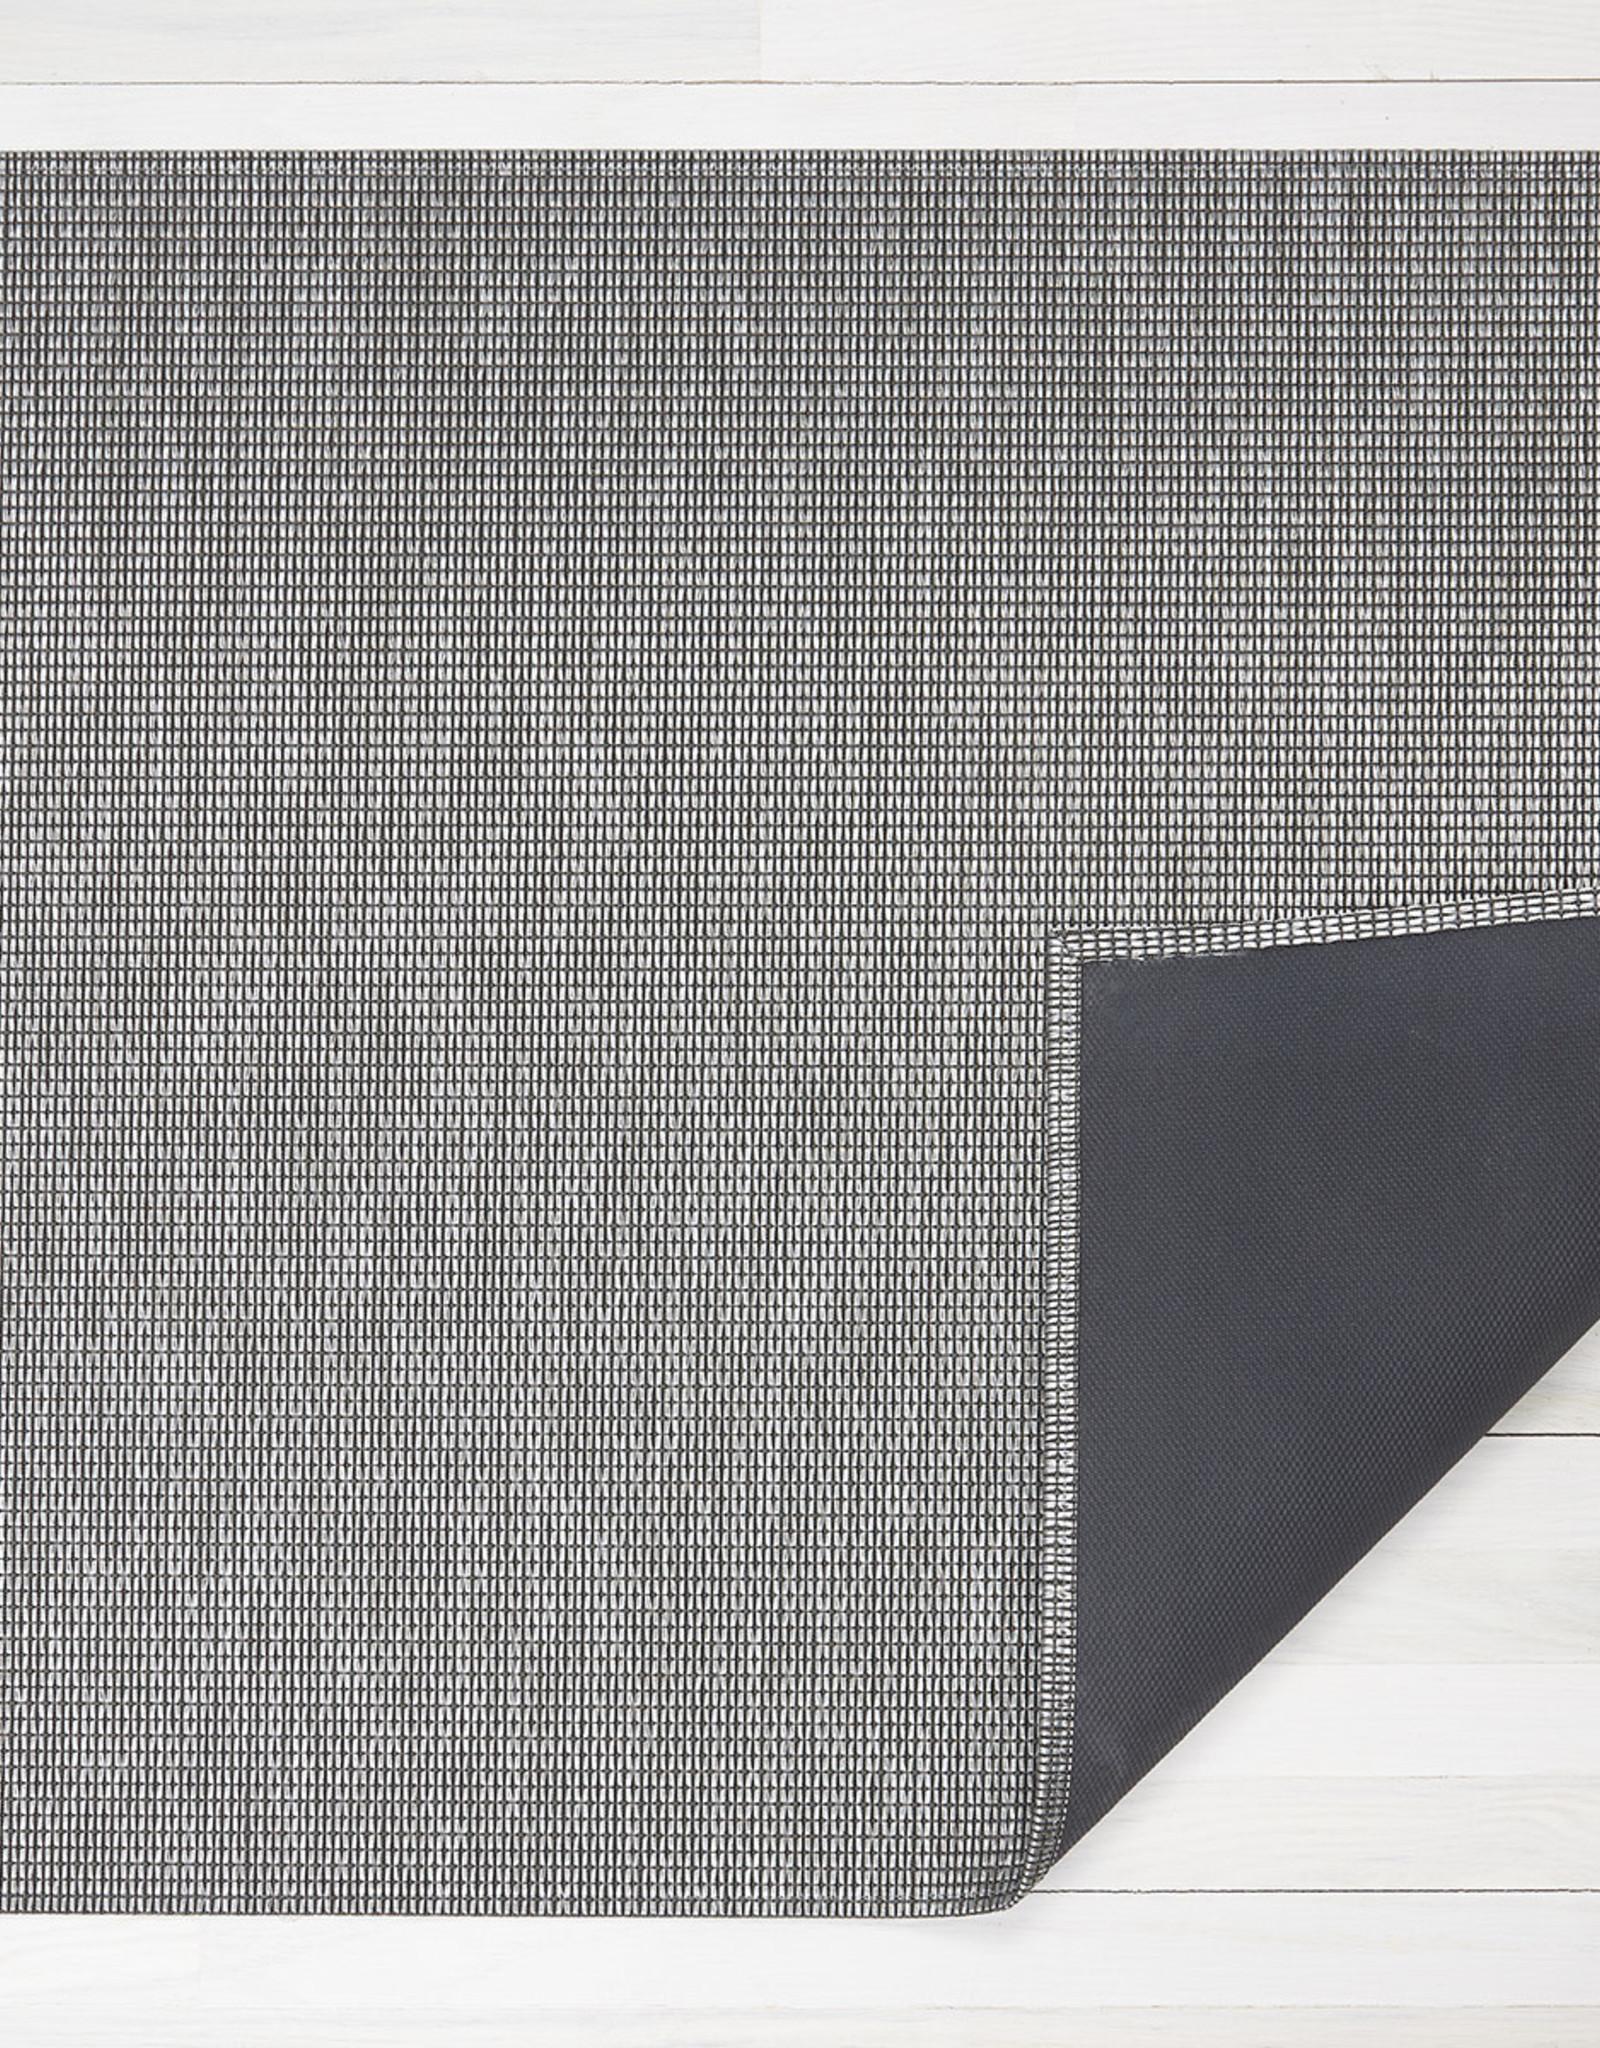 Chilewich Wabi Sabi Floormat 46 x 72, MICA